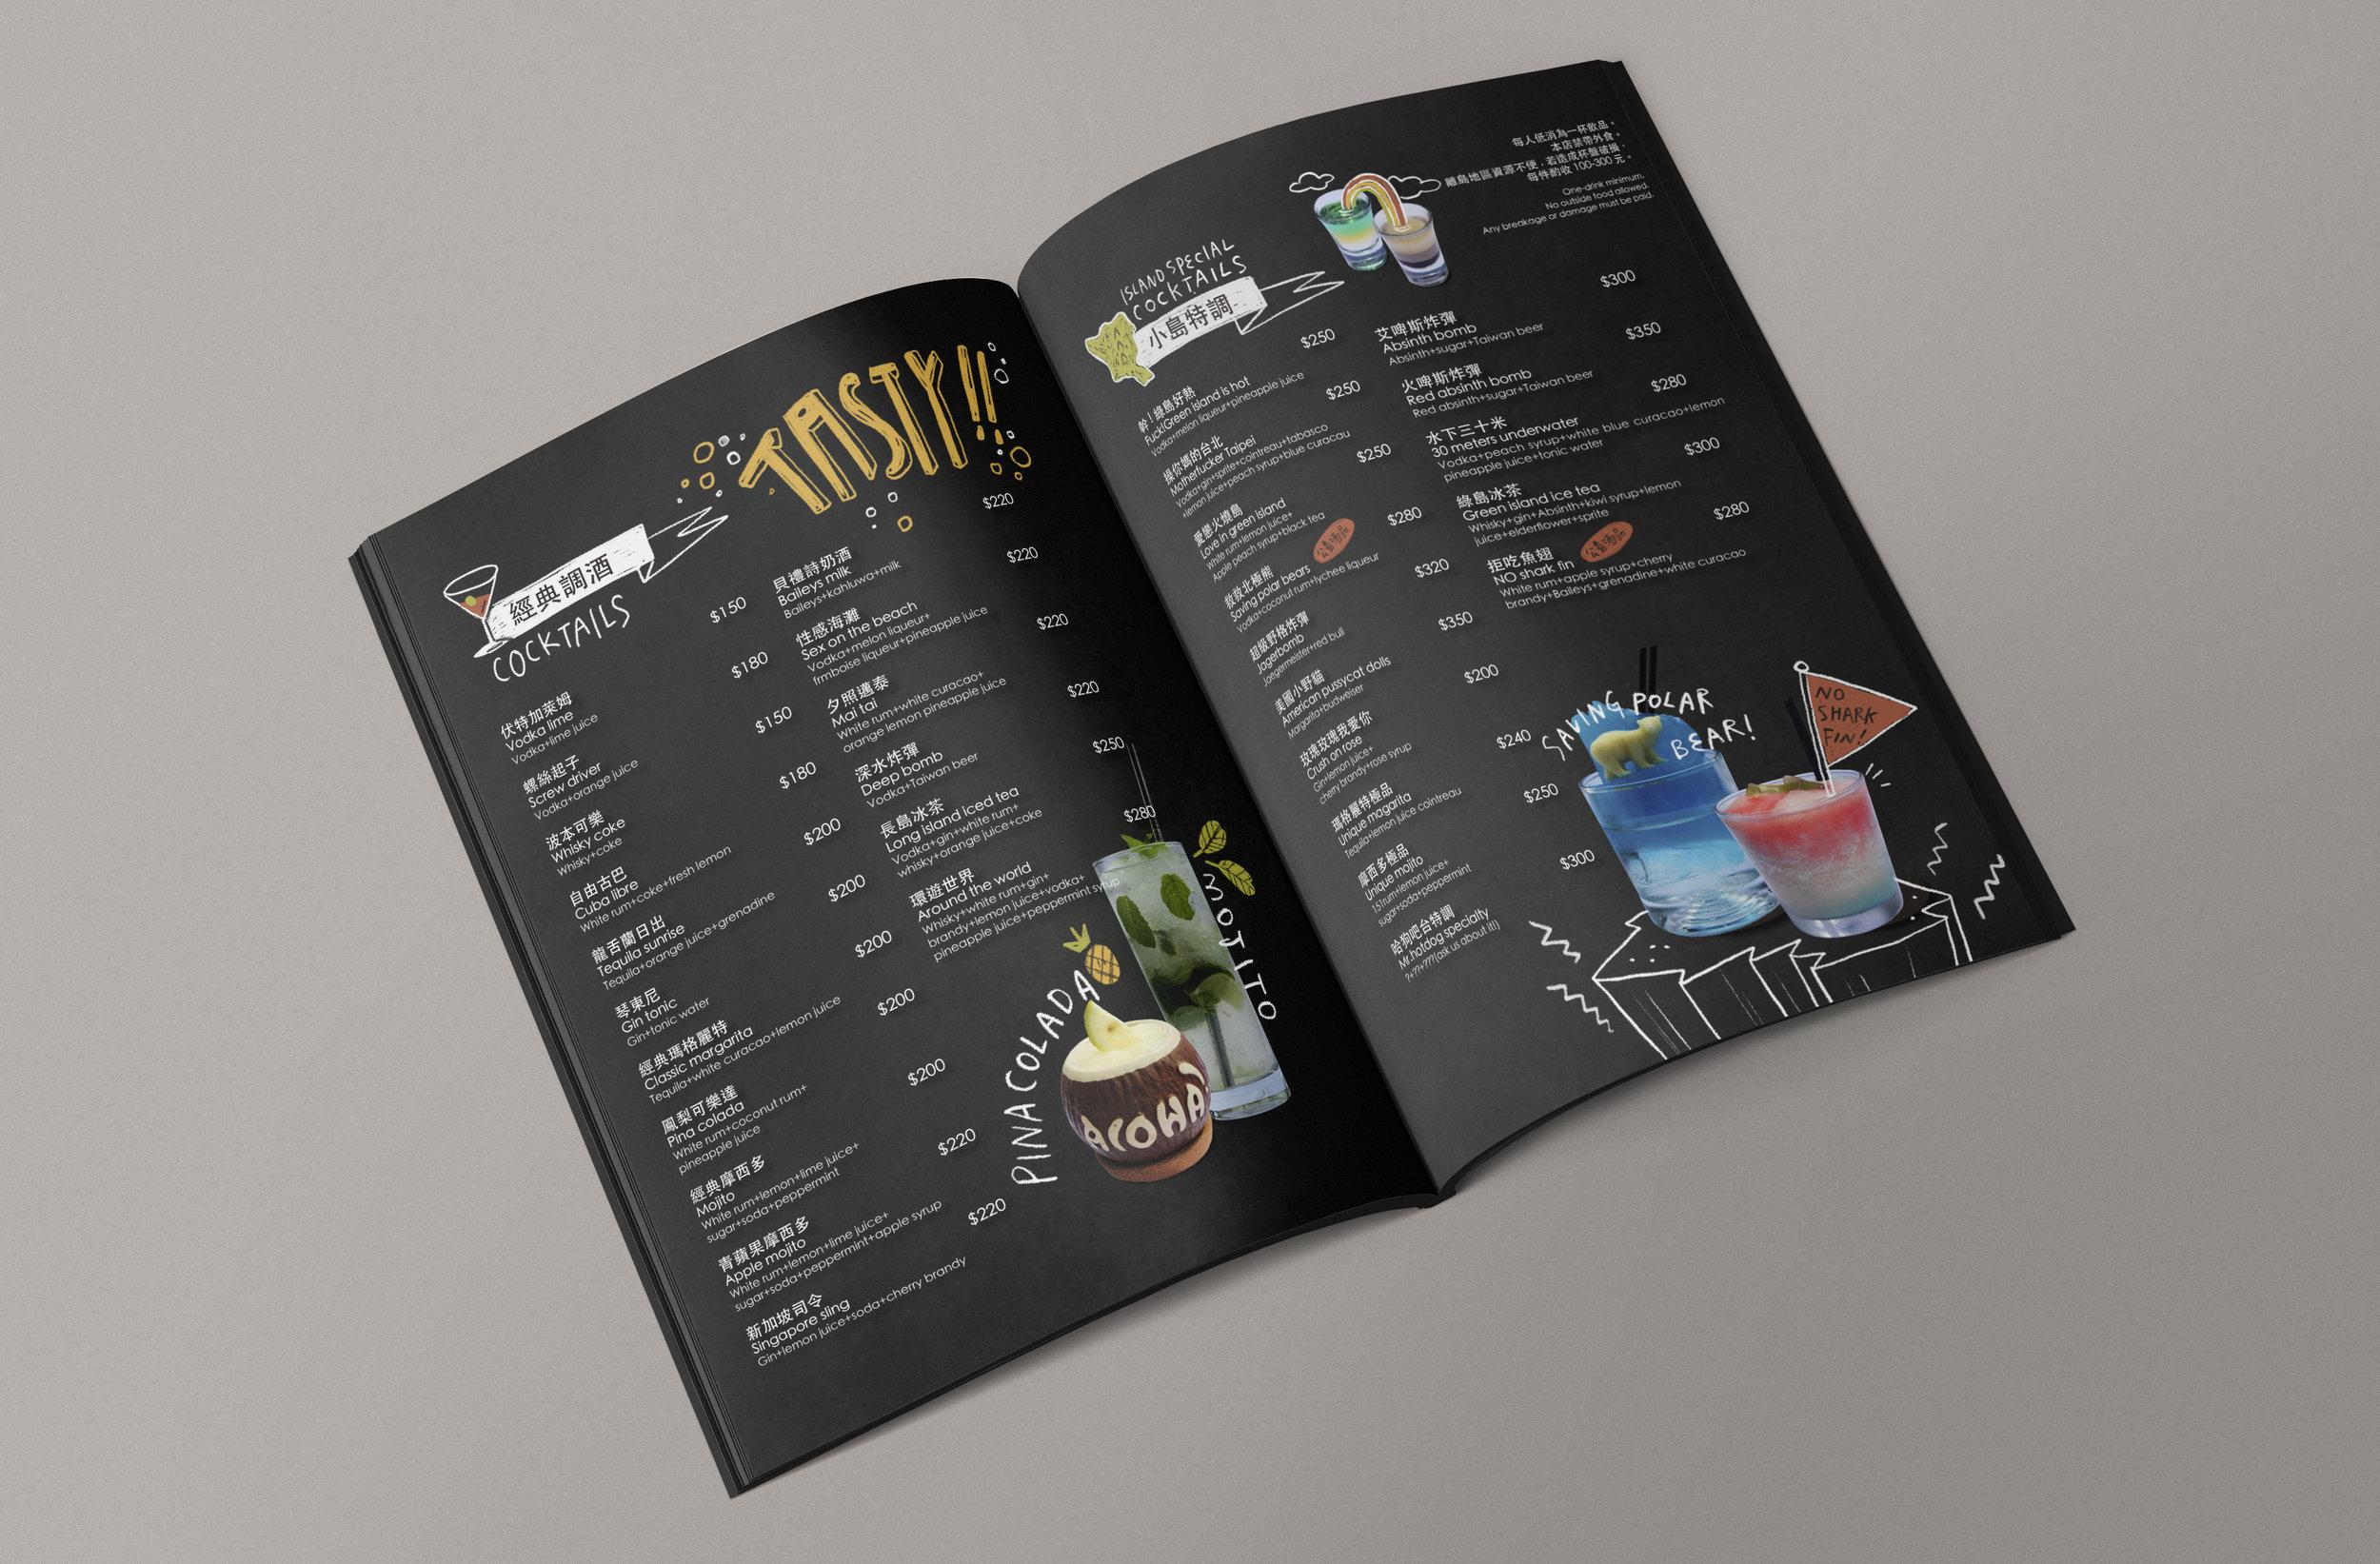 169-magazine-mockup-02.jpg